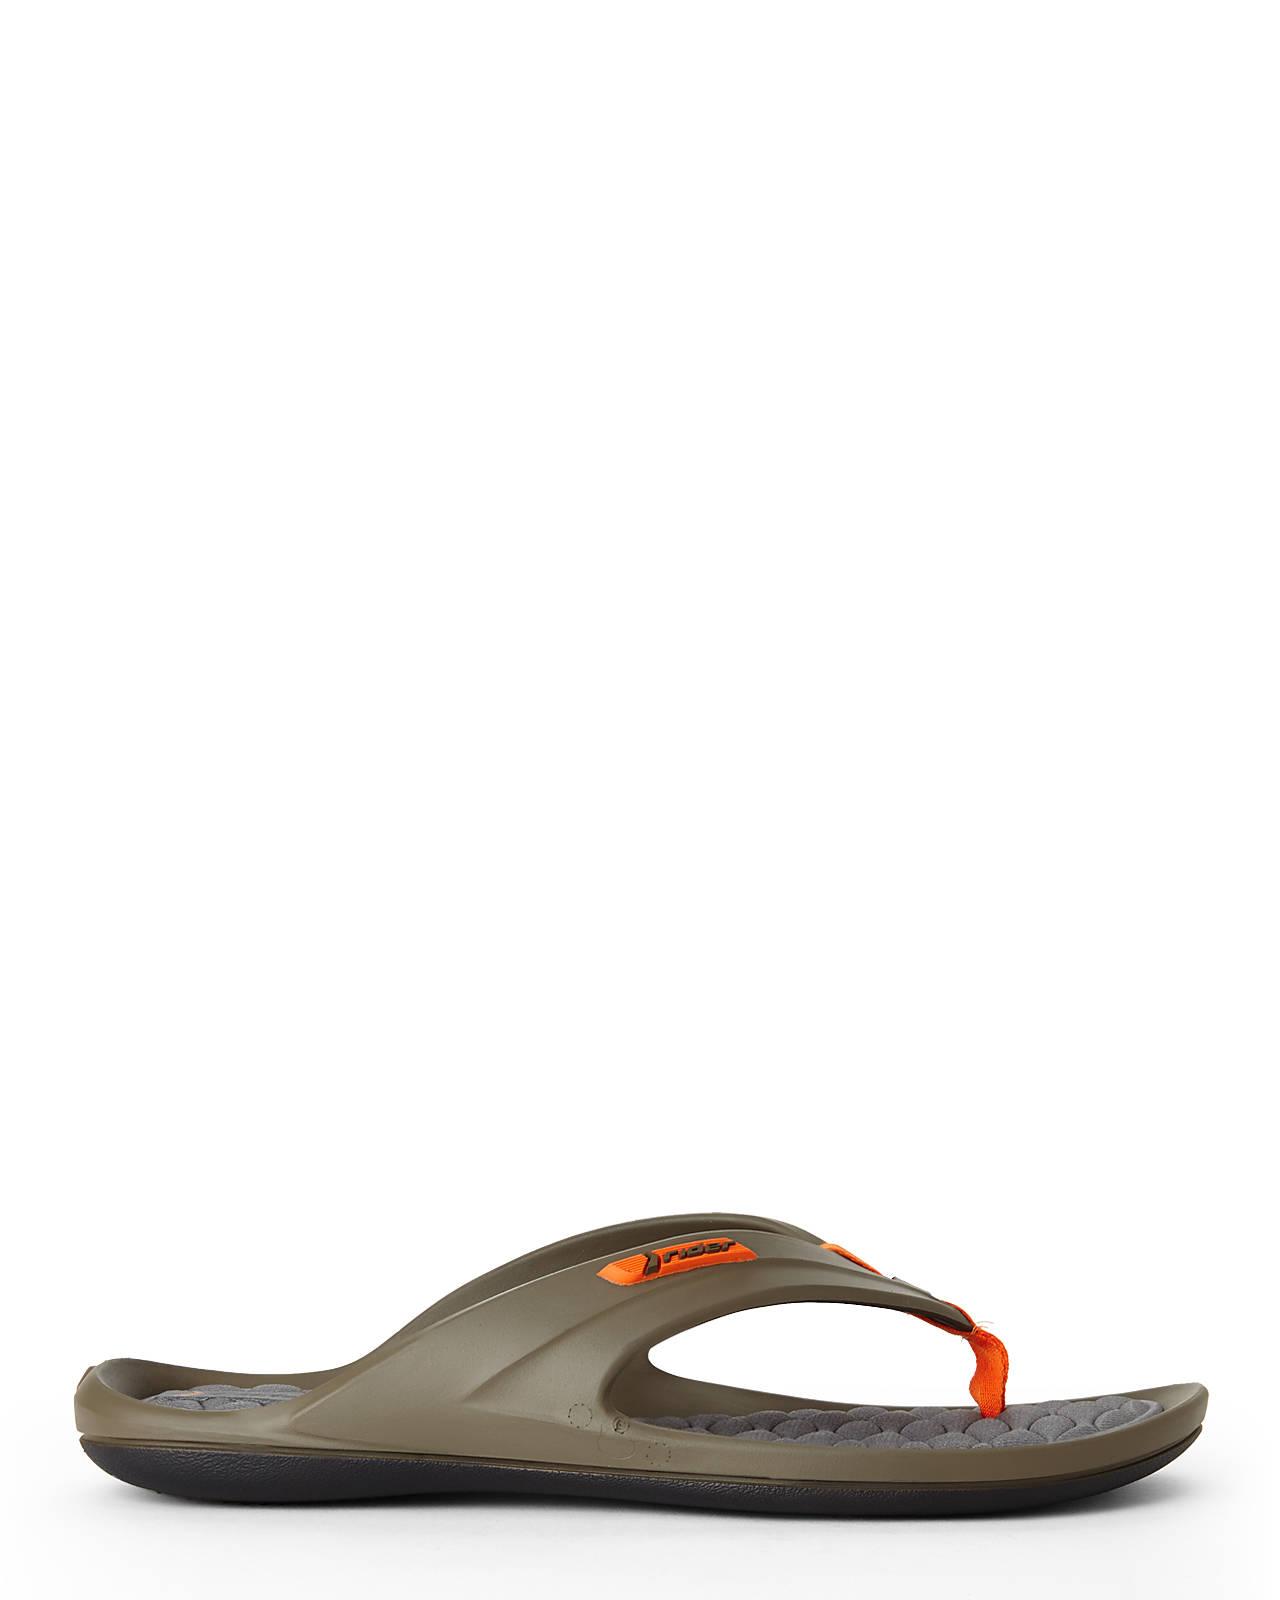 f743792b2db9 Lyst - Rider Taupe   Orange Gulf Sandals in Brown for Men